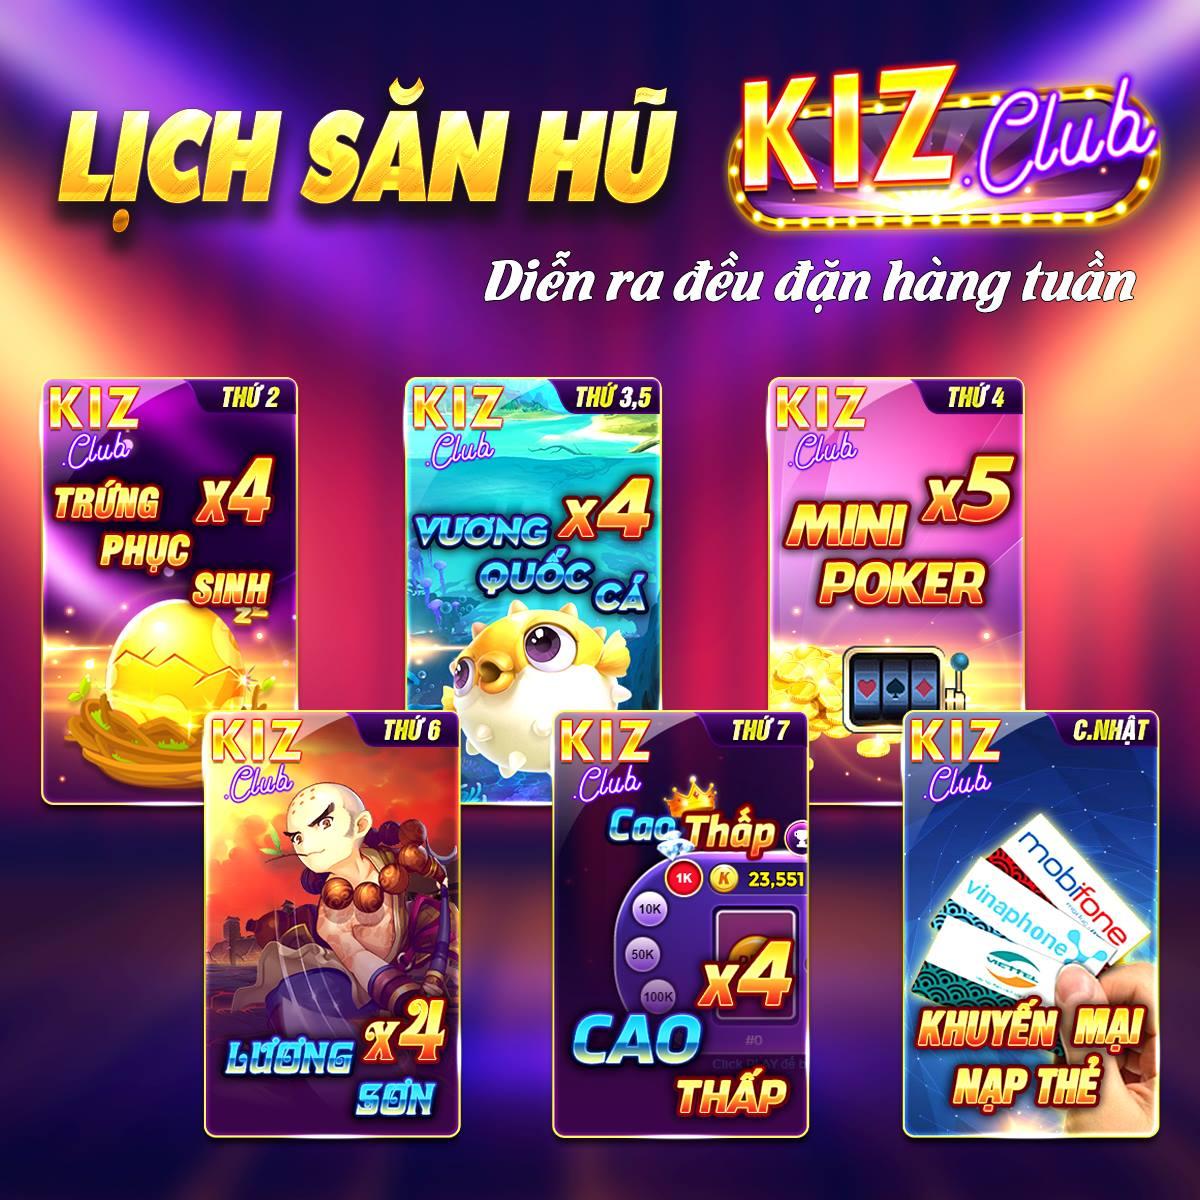 nhung-su-kien-hot-tai-game-bai-kizclub